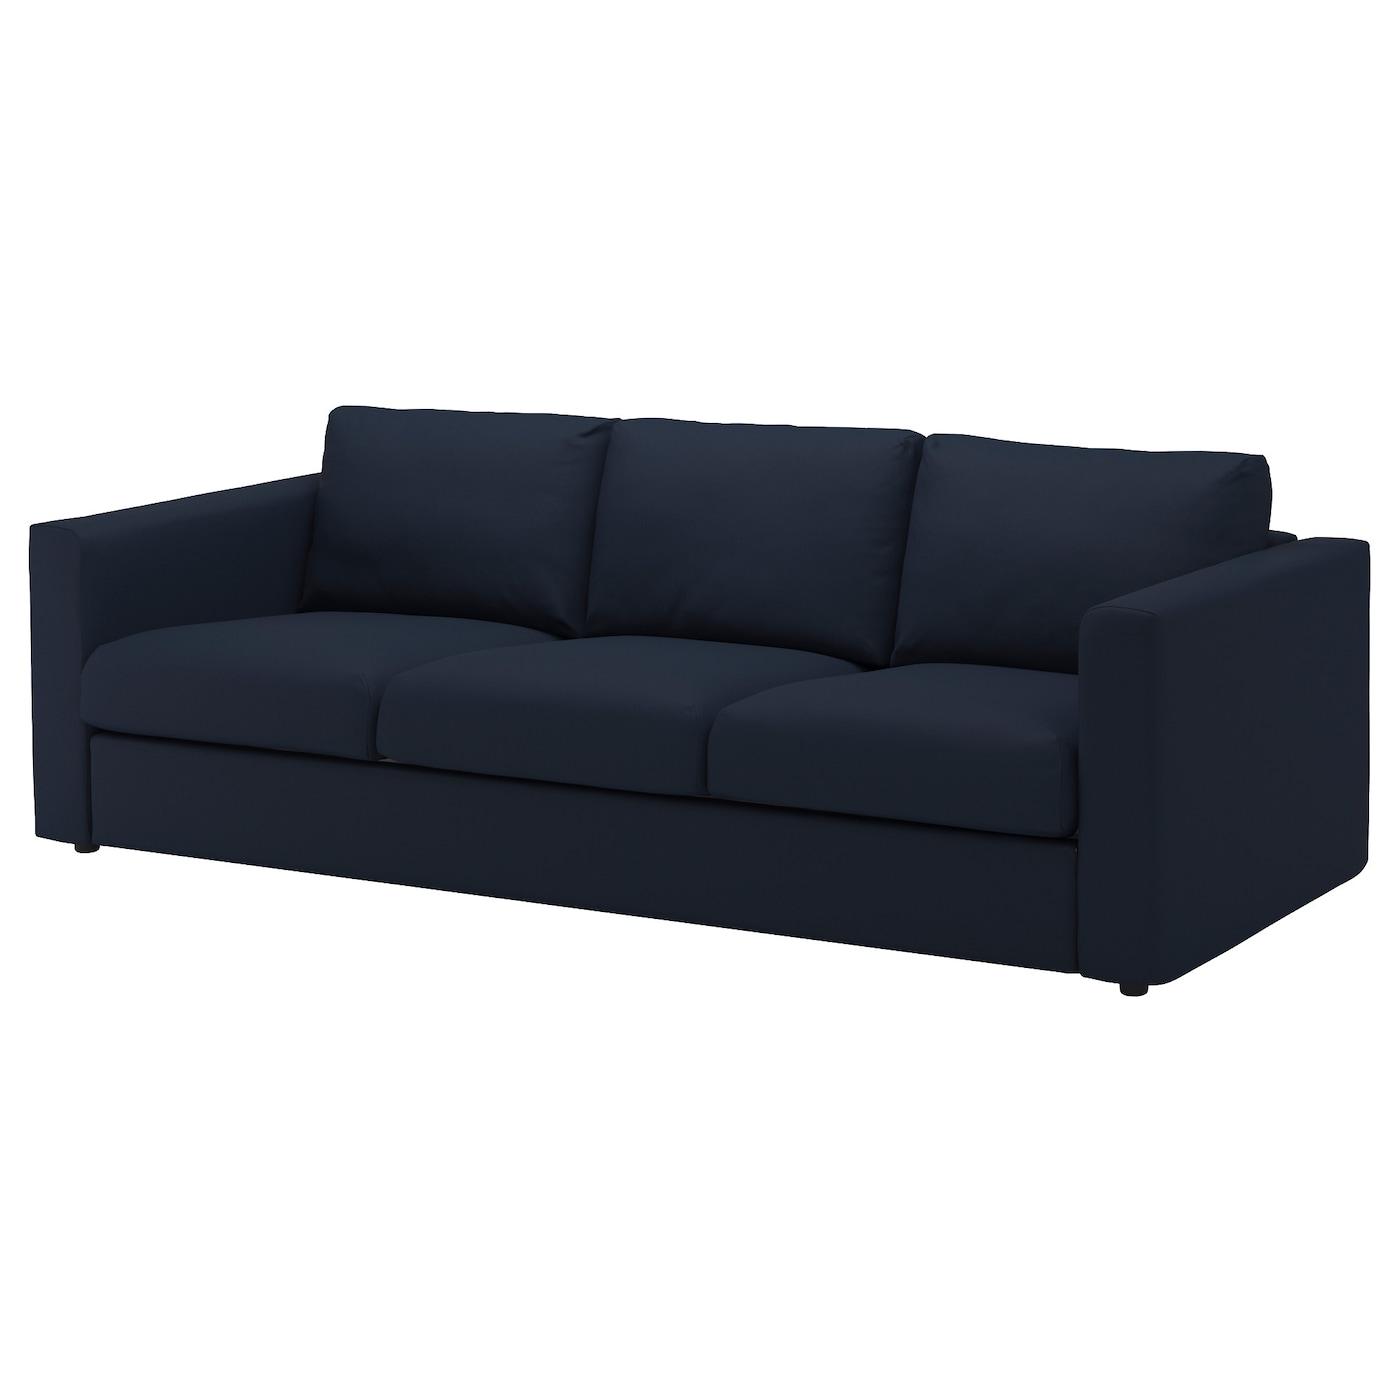 VIMLE Cover for 3 seat sofa Gräsbo black blue IKEA